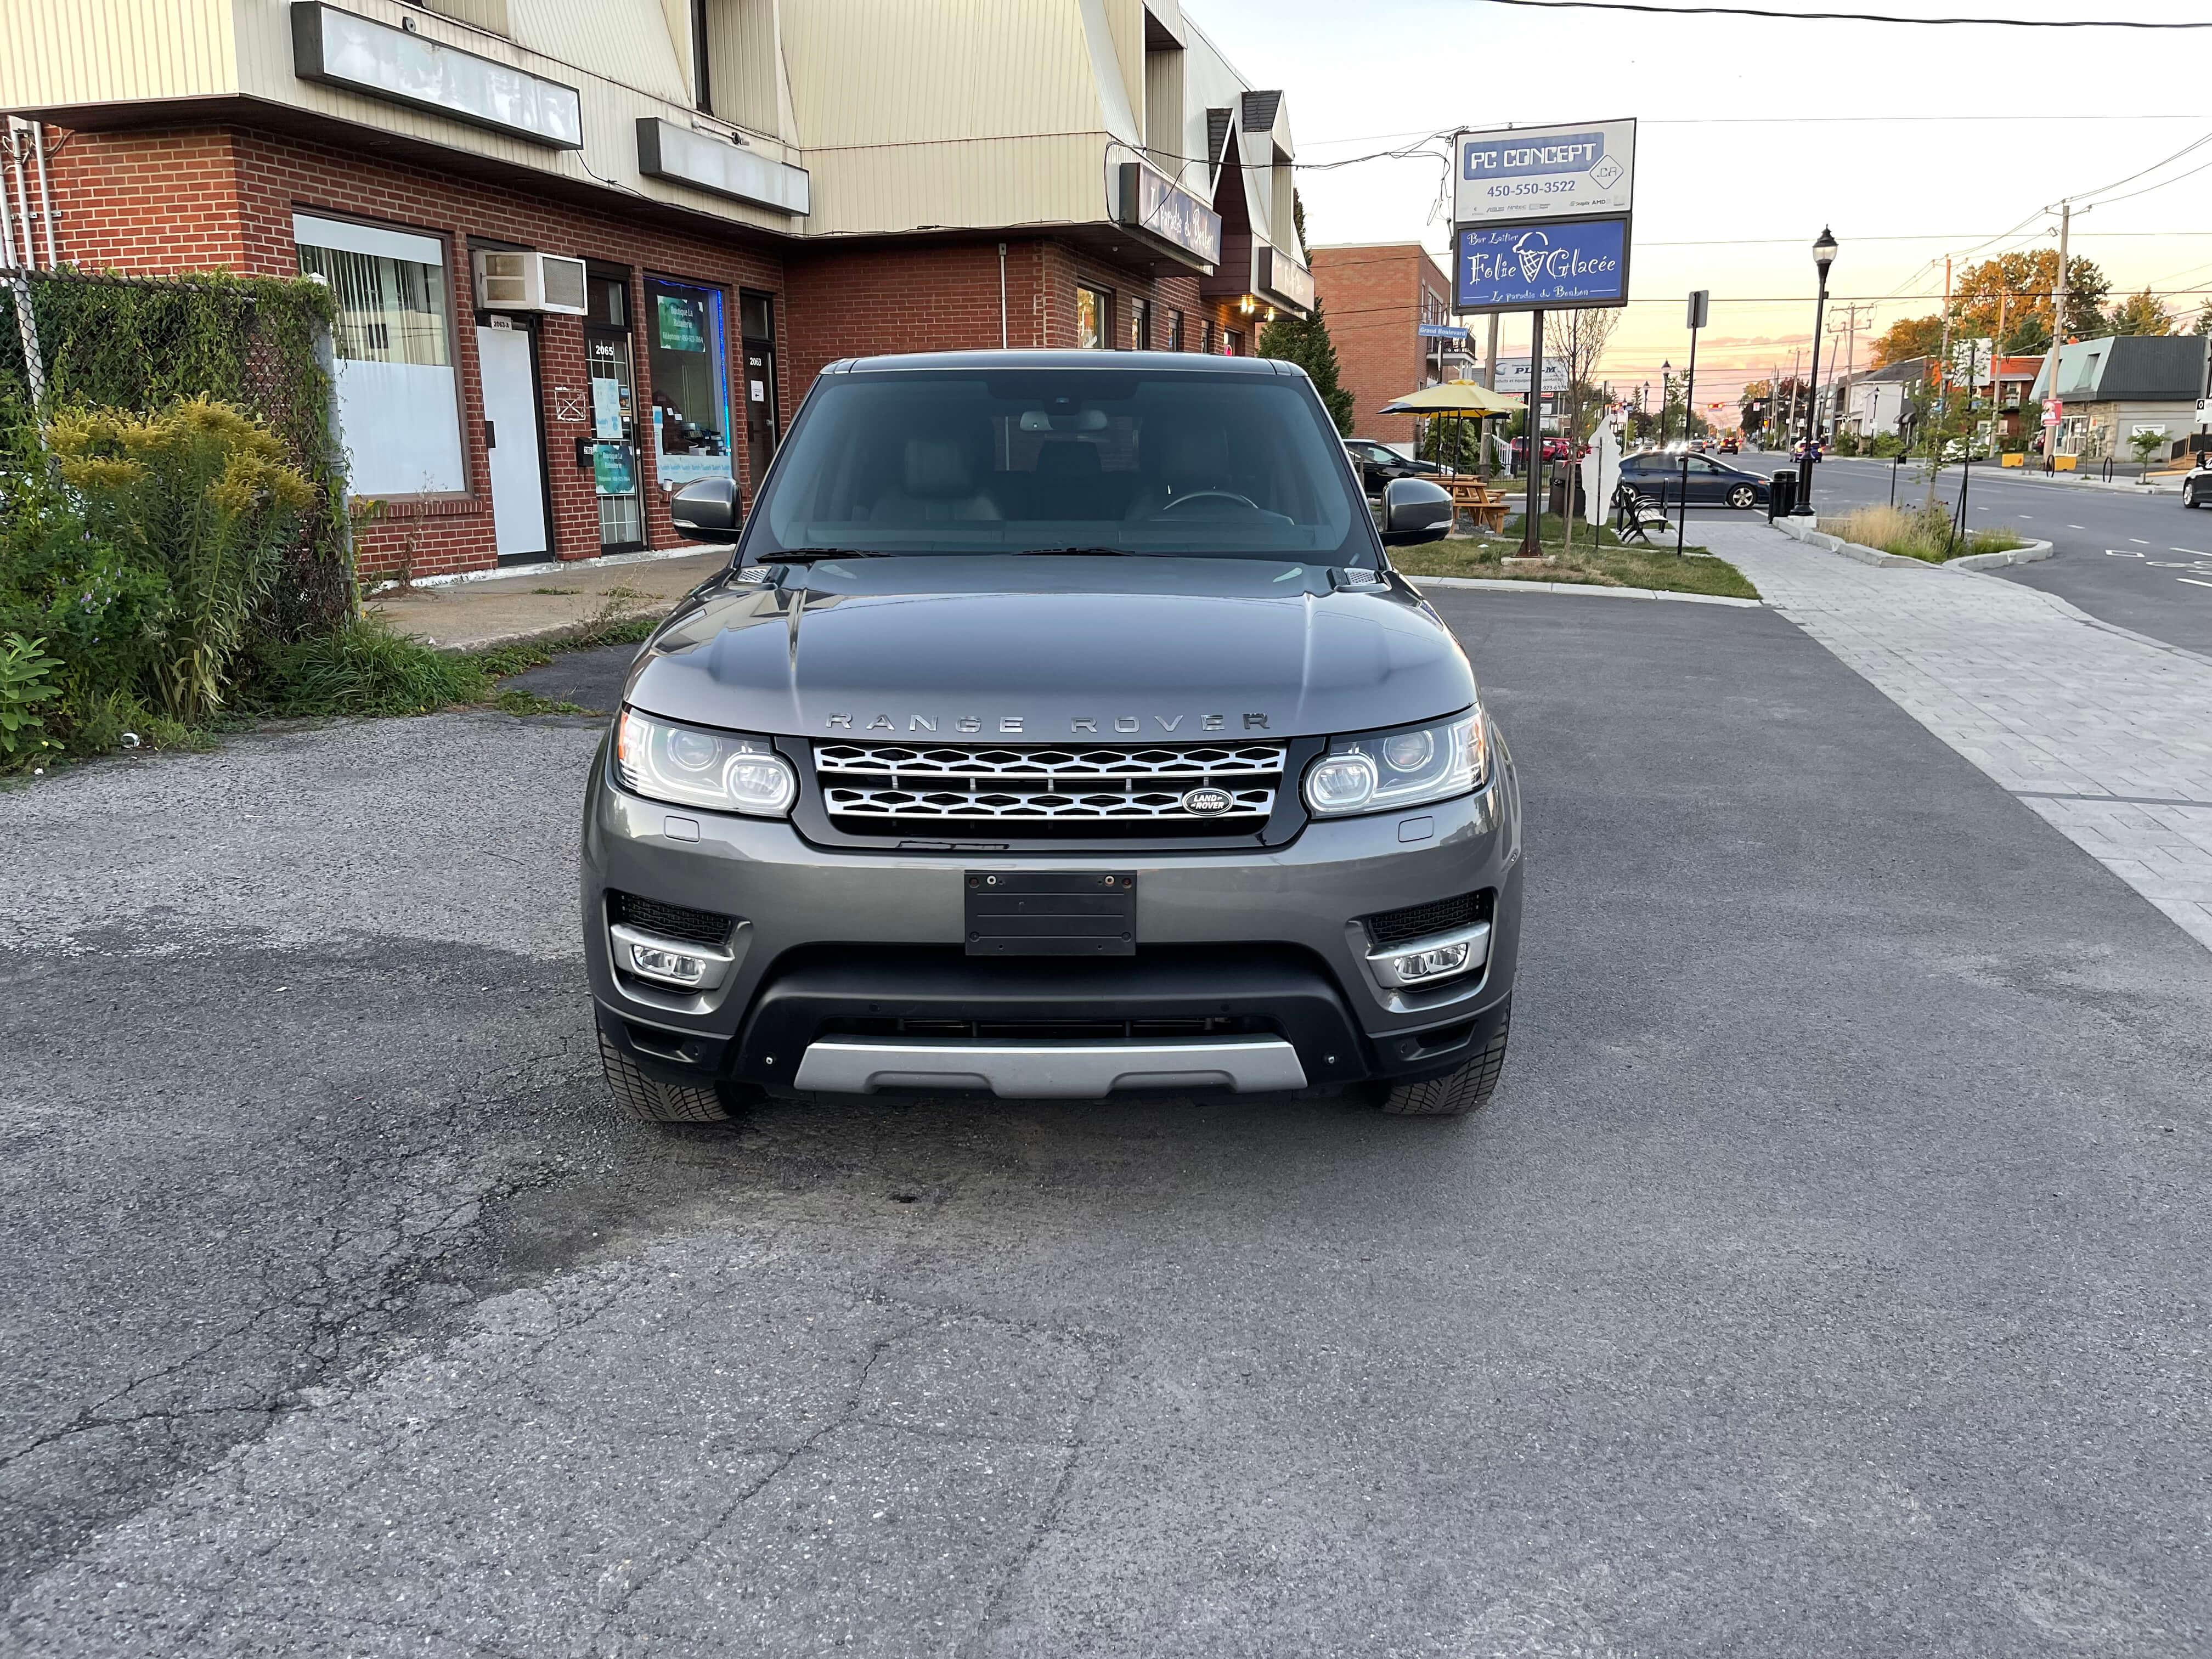 2014 Land Rover Range Rover Sport complet